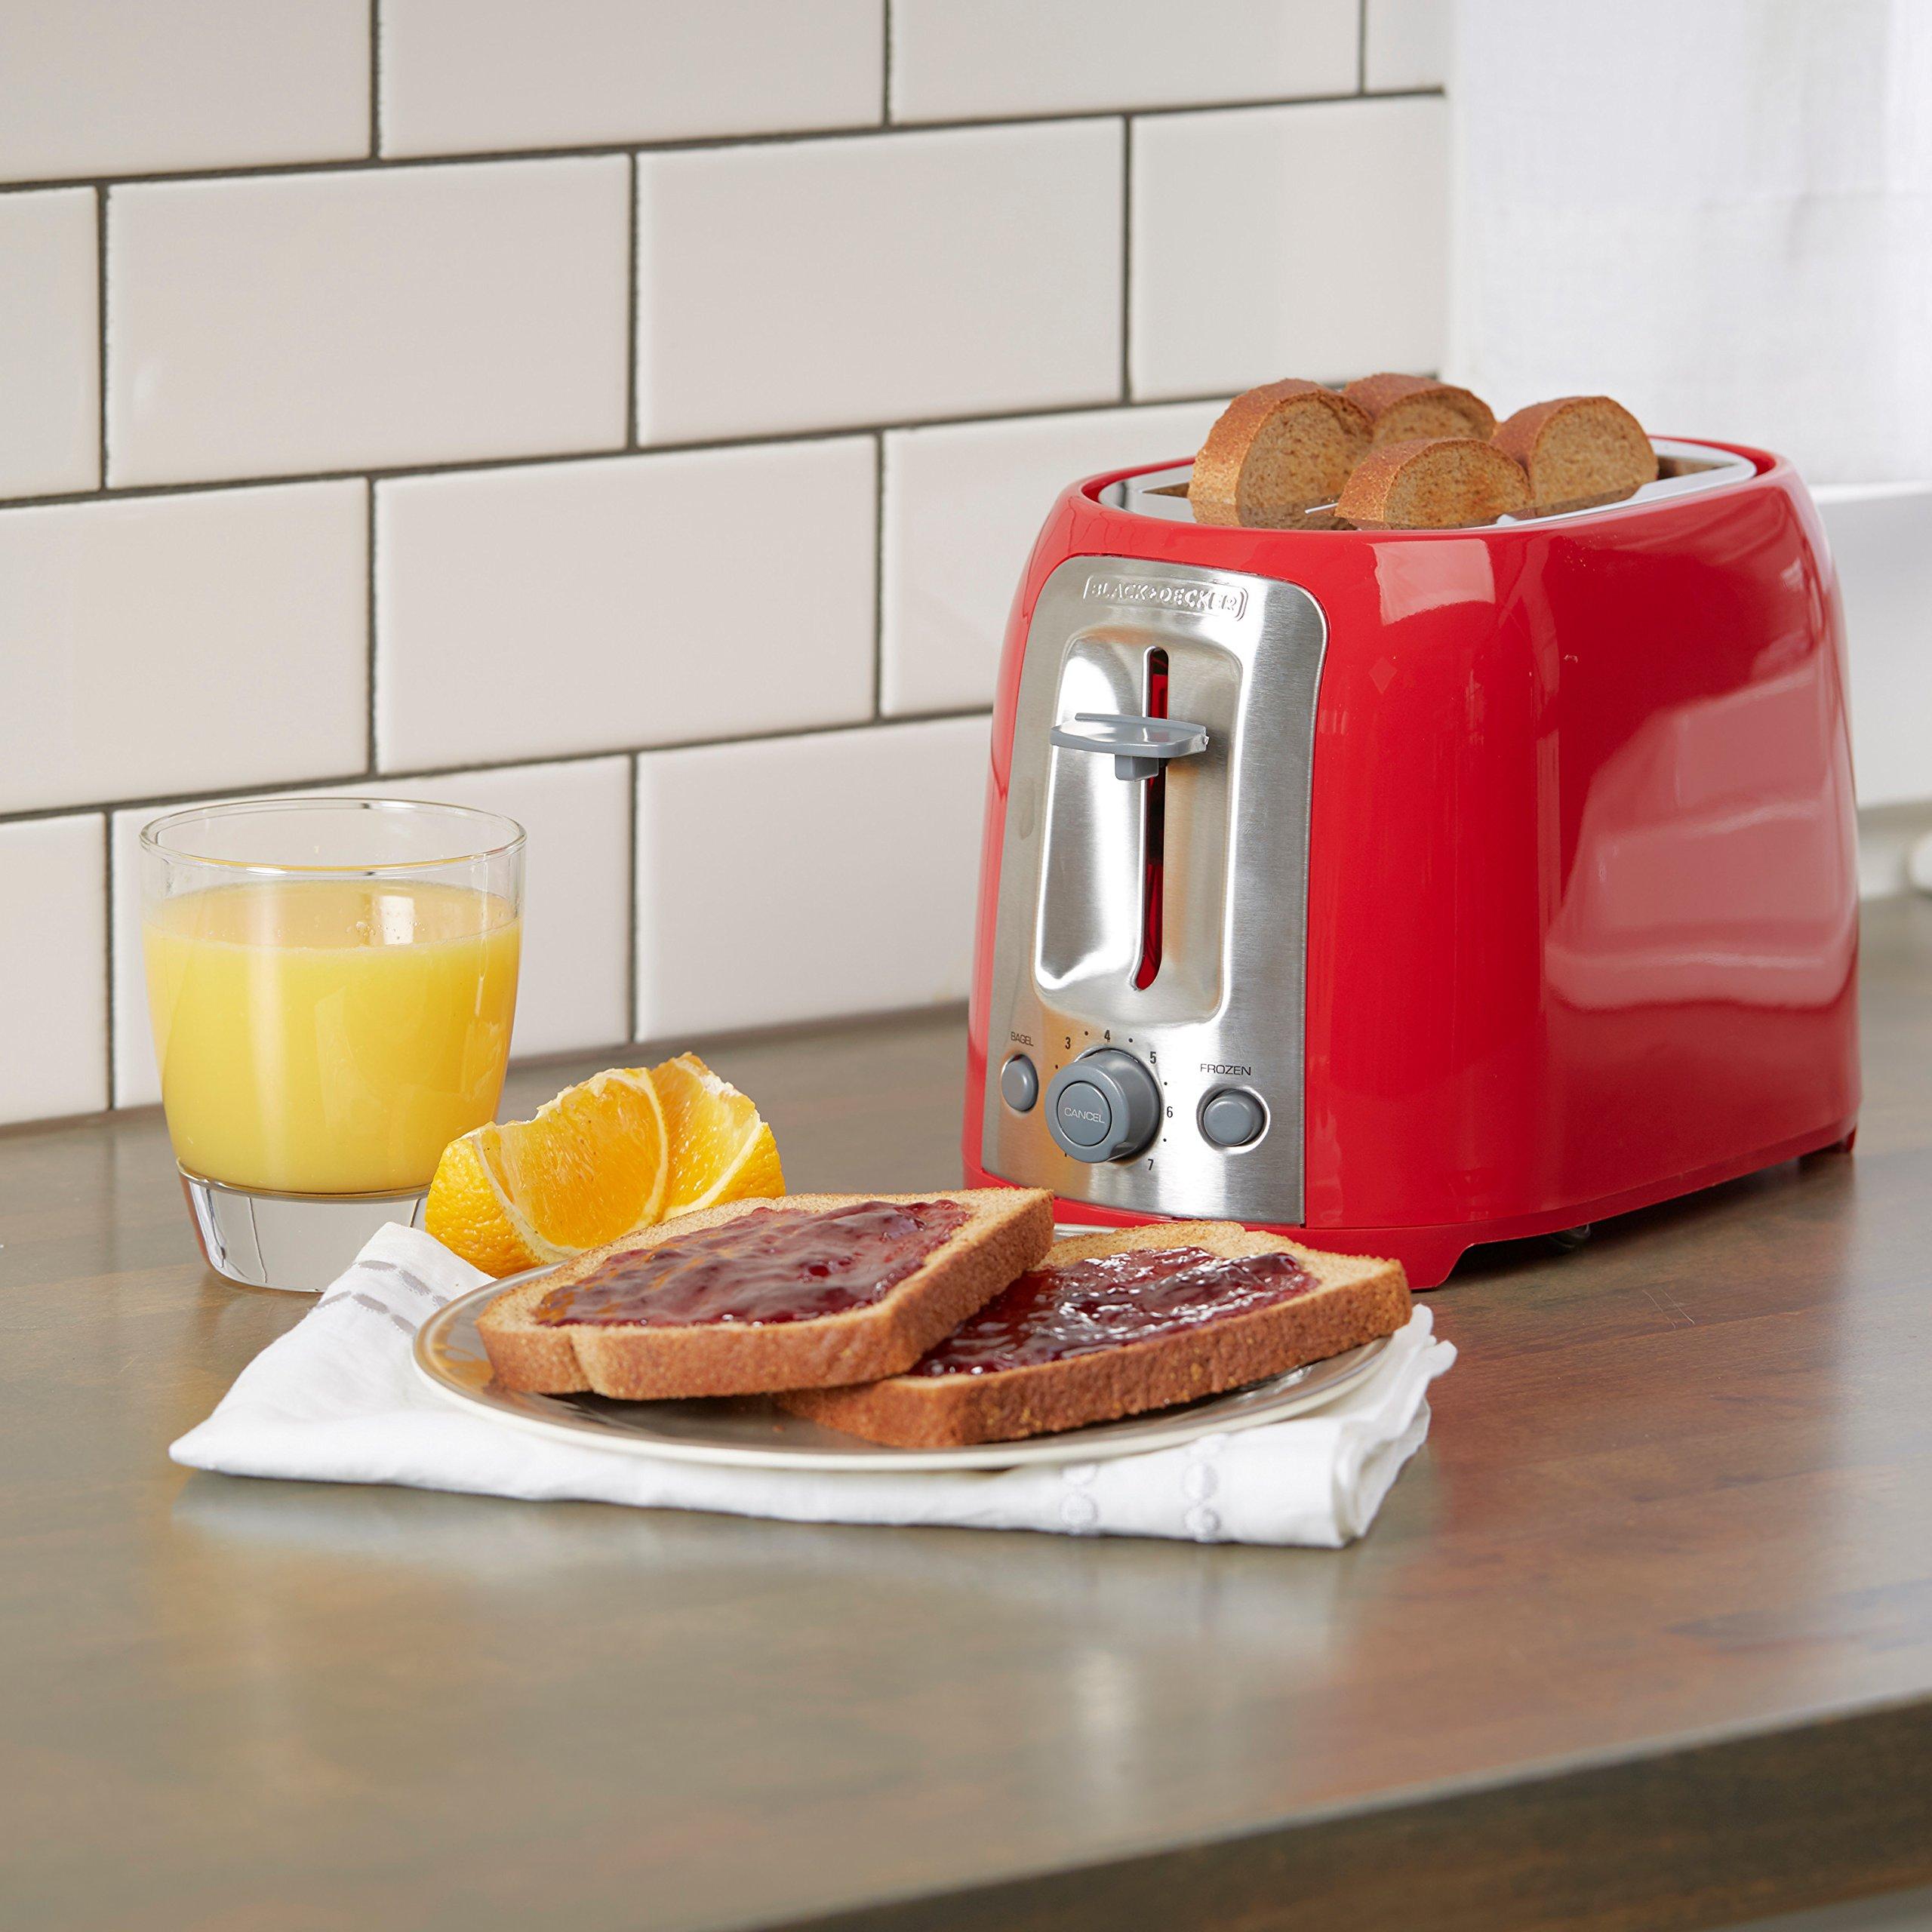 BLACK+DECKER 2-Slice Toaster, Red, TR1278RM by BLACK+DECKER (Image #5)